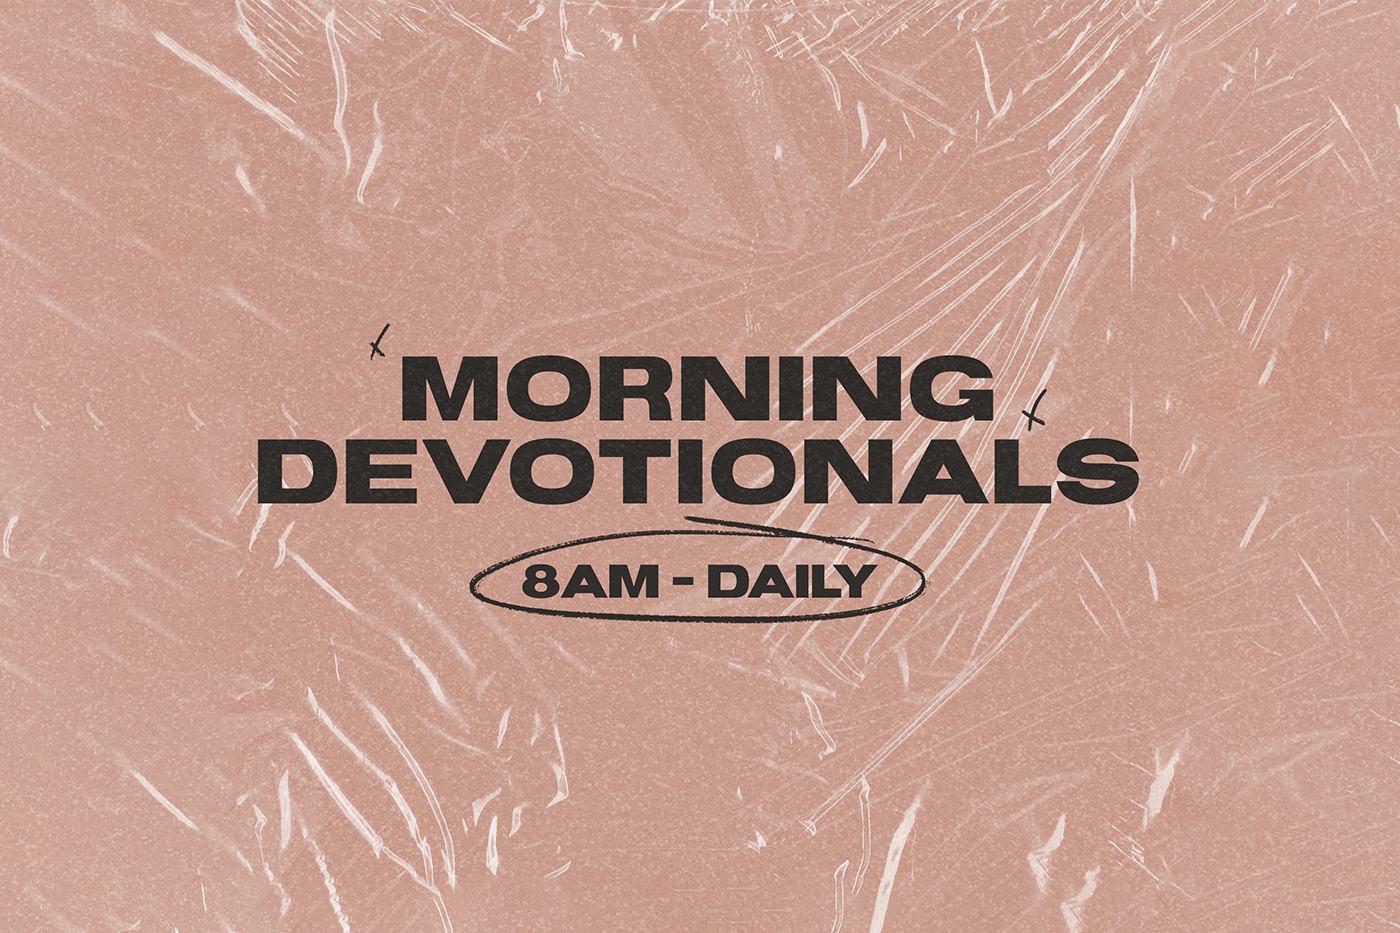 Morning devotionals